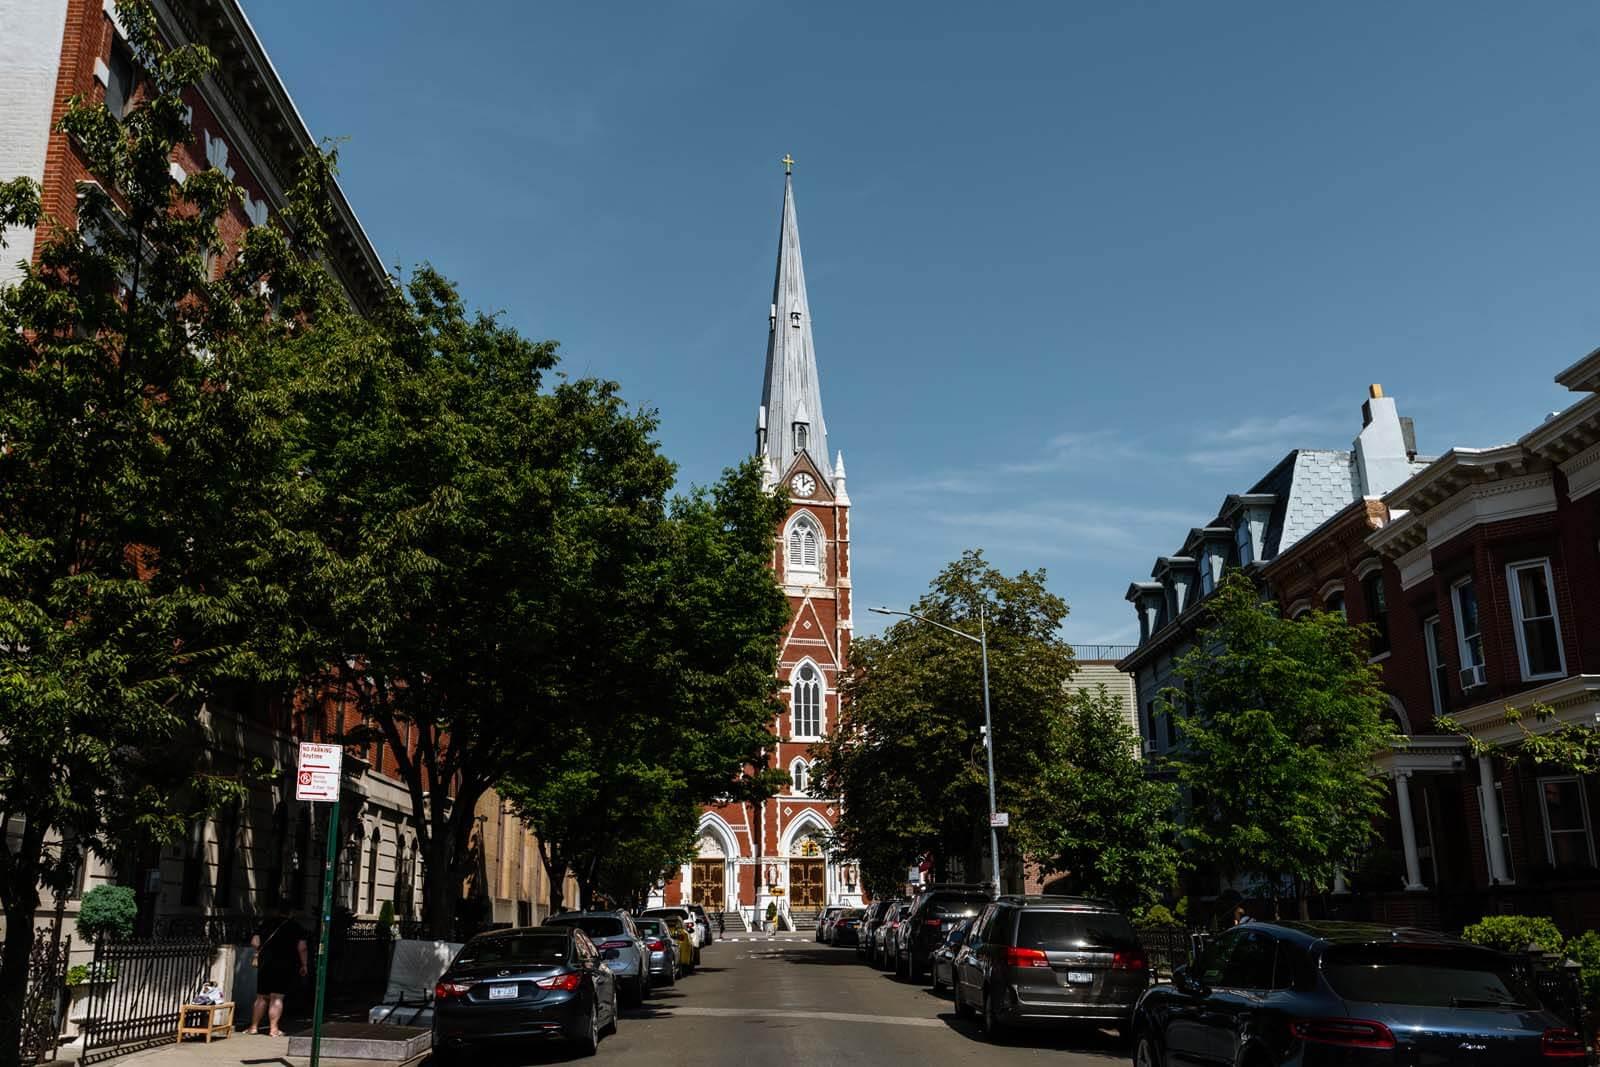 St. Anthony of Padua – St. Alphonsus Parish church in Greenpoint Brooklyn